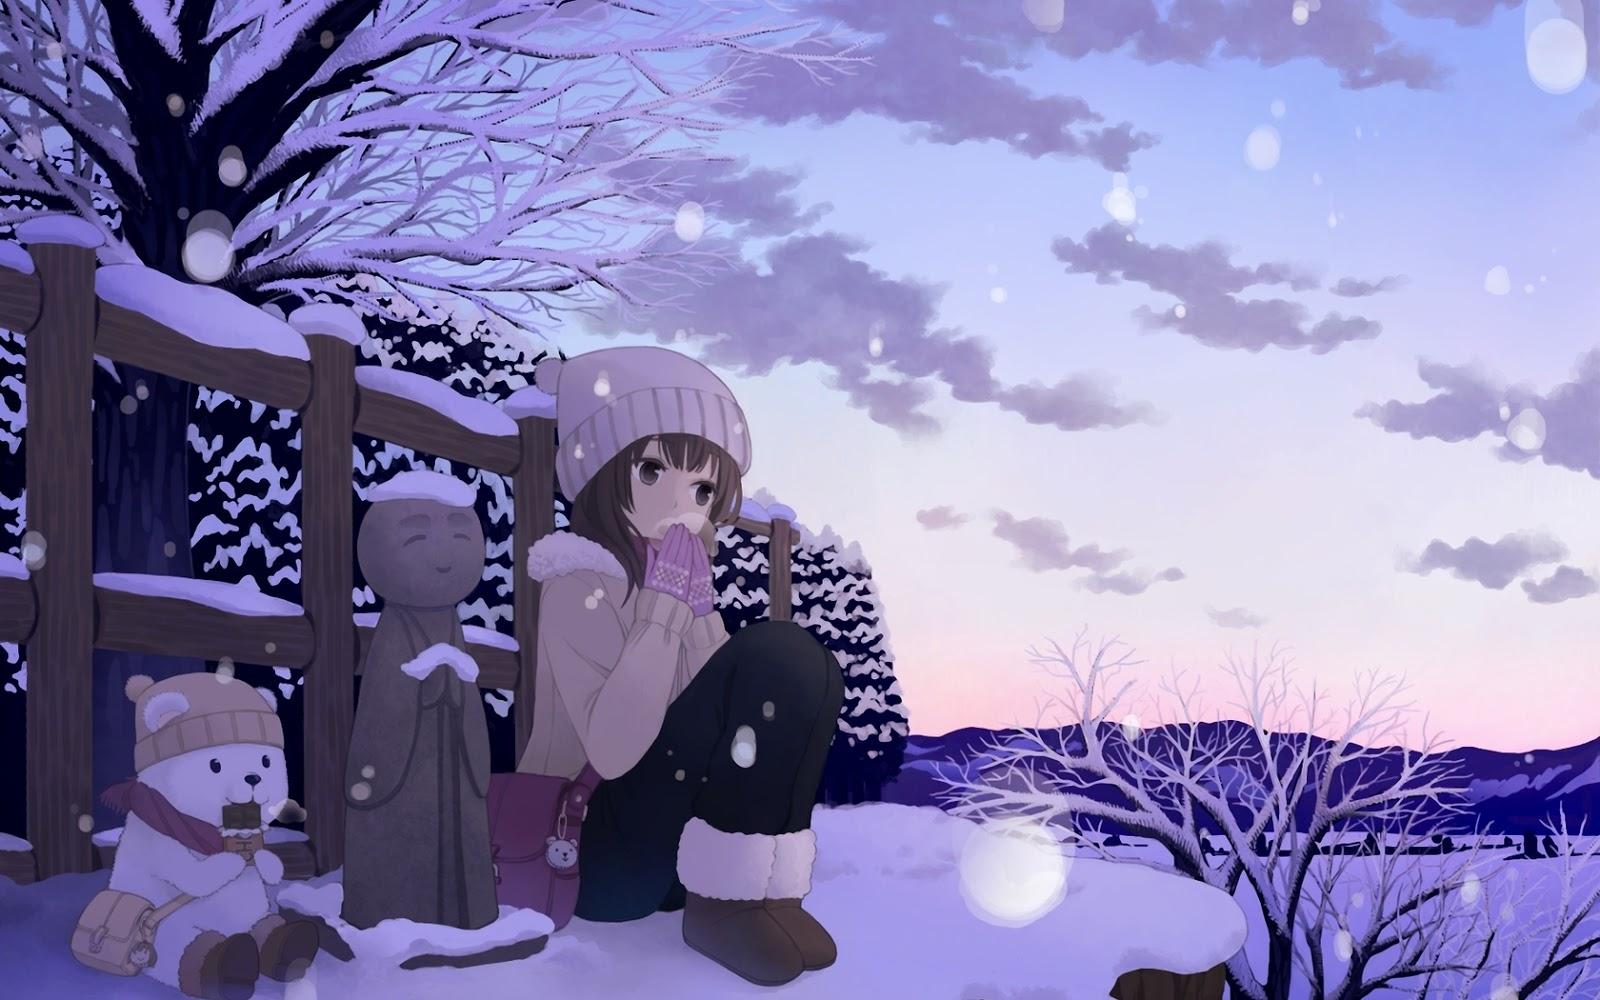 Anime winter